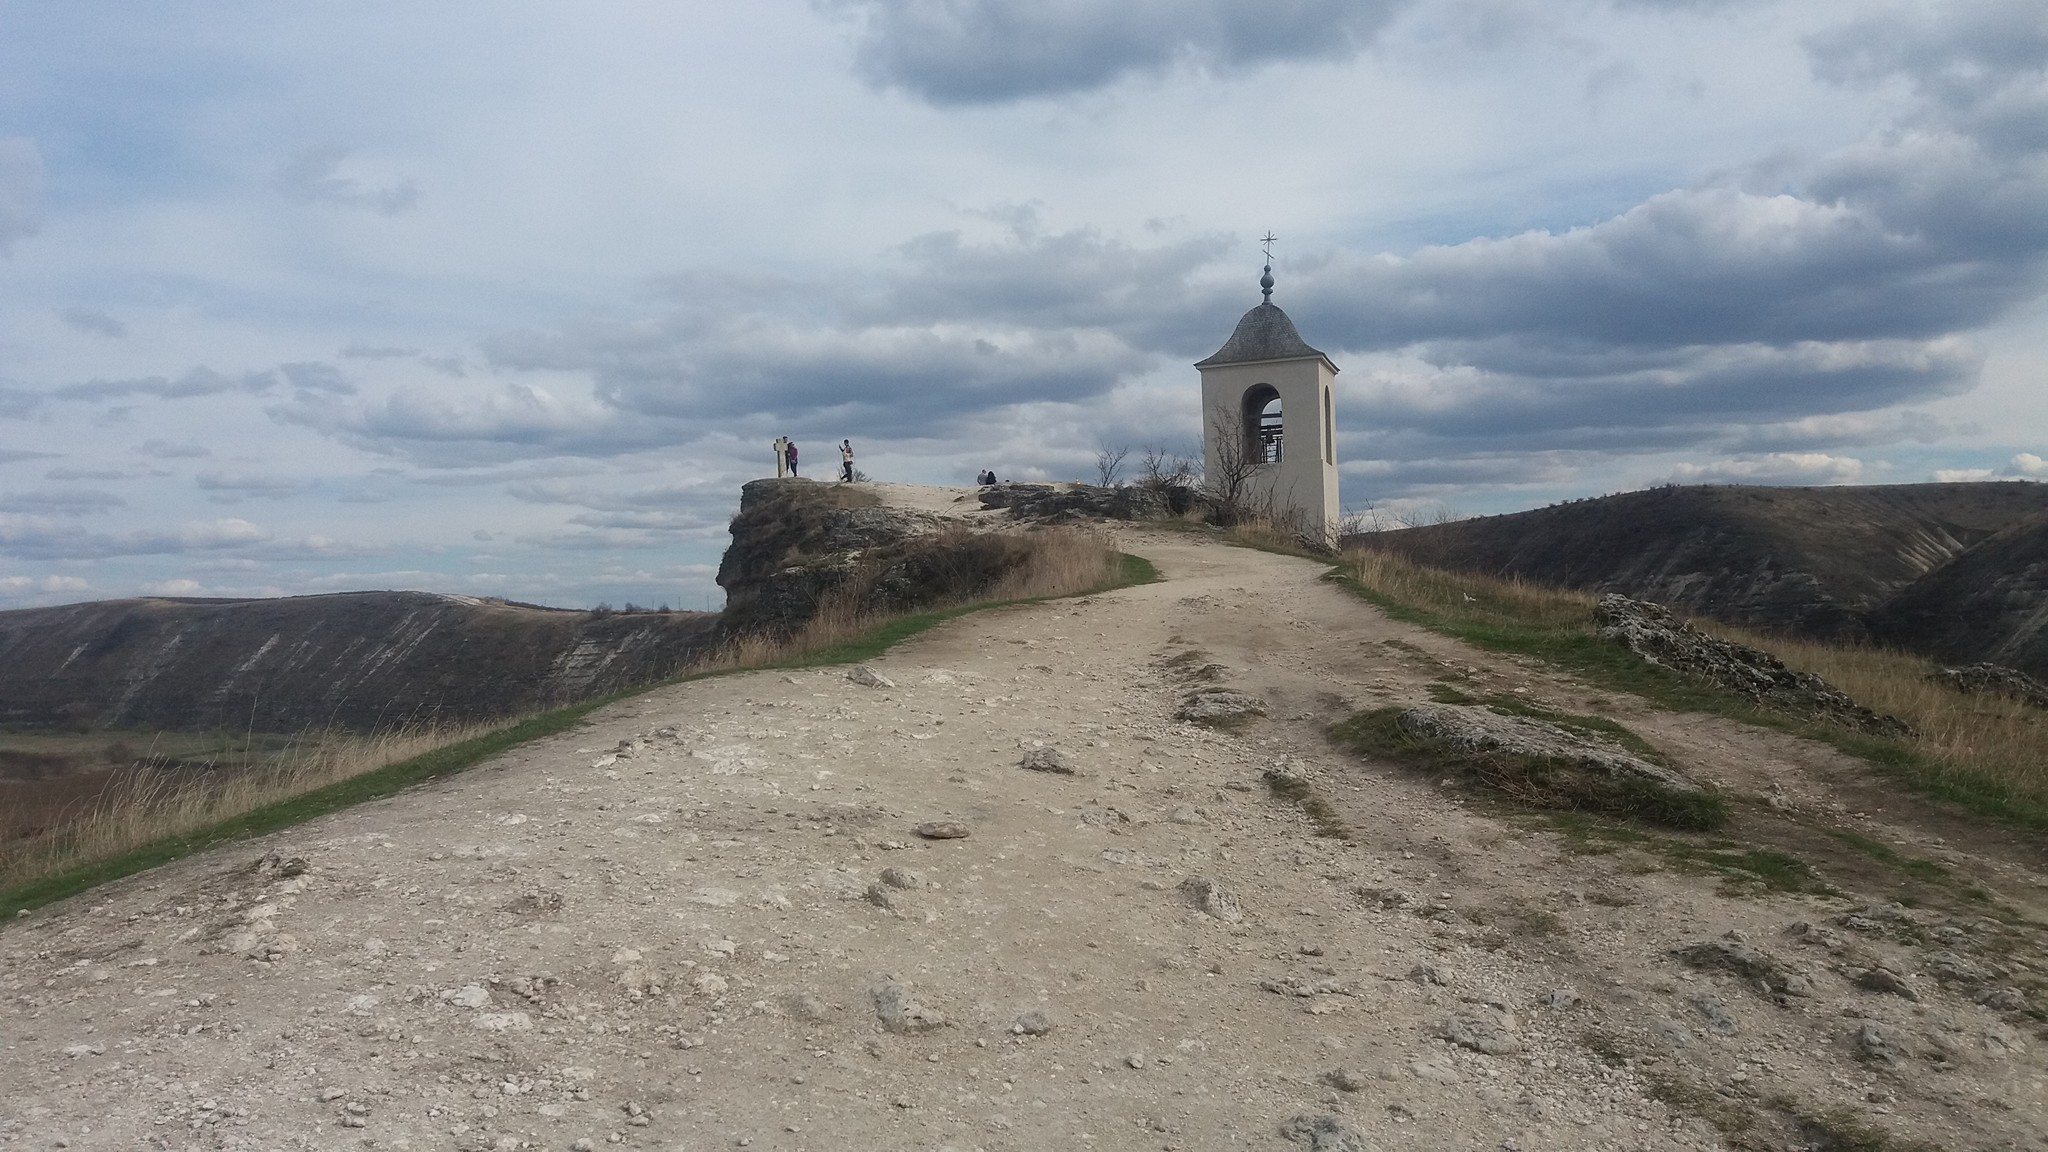 Monastère Orheiul Vechi en Moldavie